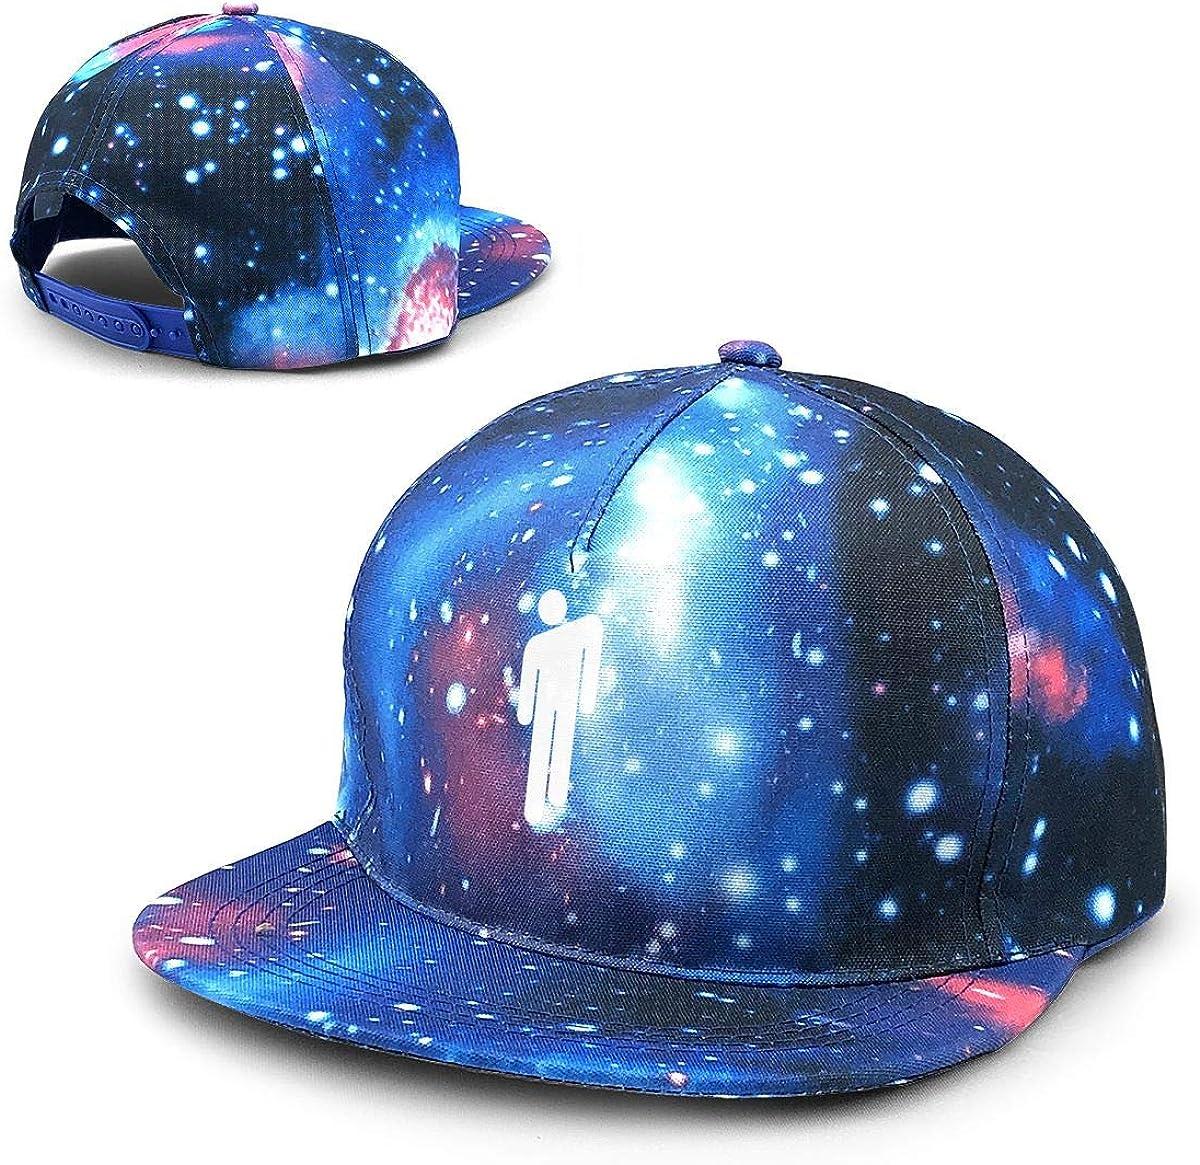 Myzly Billie Eilish Merch Kids Star Hat Baseball Cap Classic Fashion Contrast Hip Hop Baseball Cap Blue